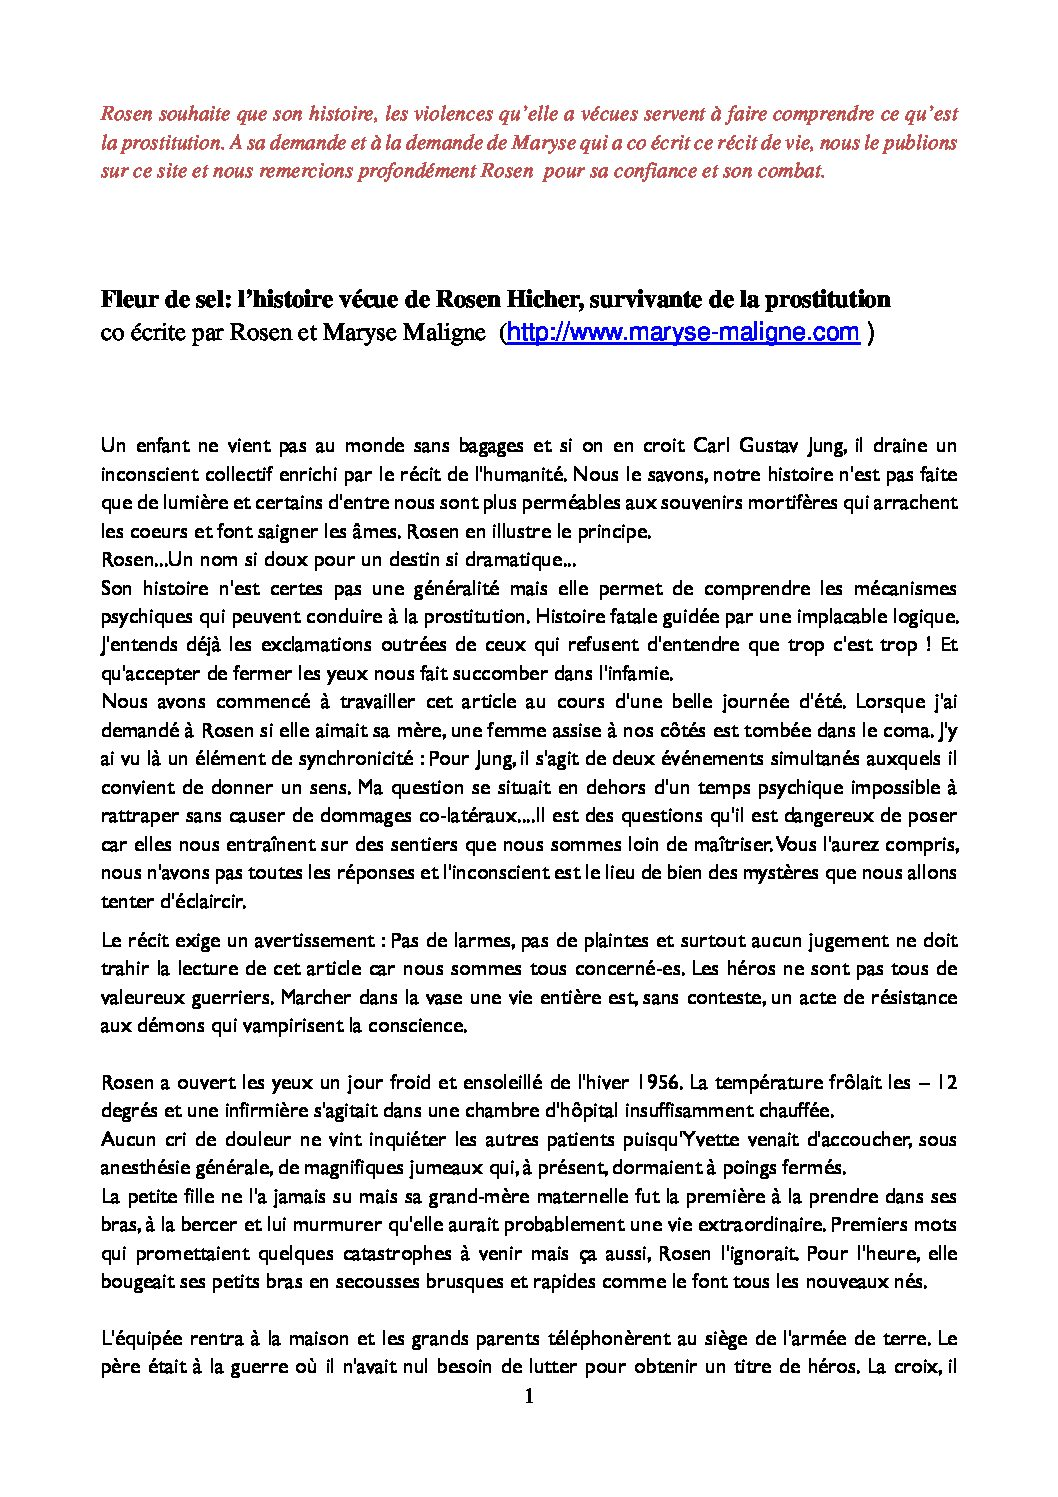 thumbnail of Fleur_de_Sel_vie_de_Rosen